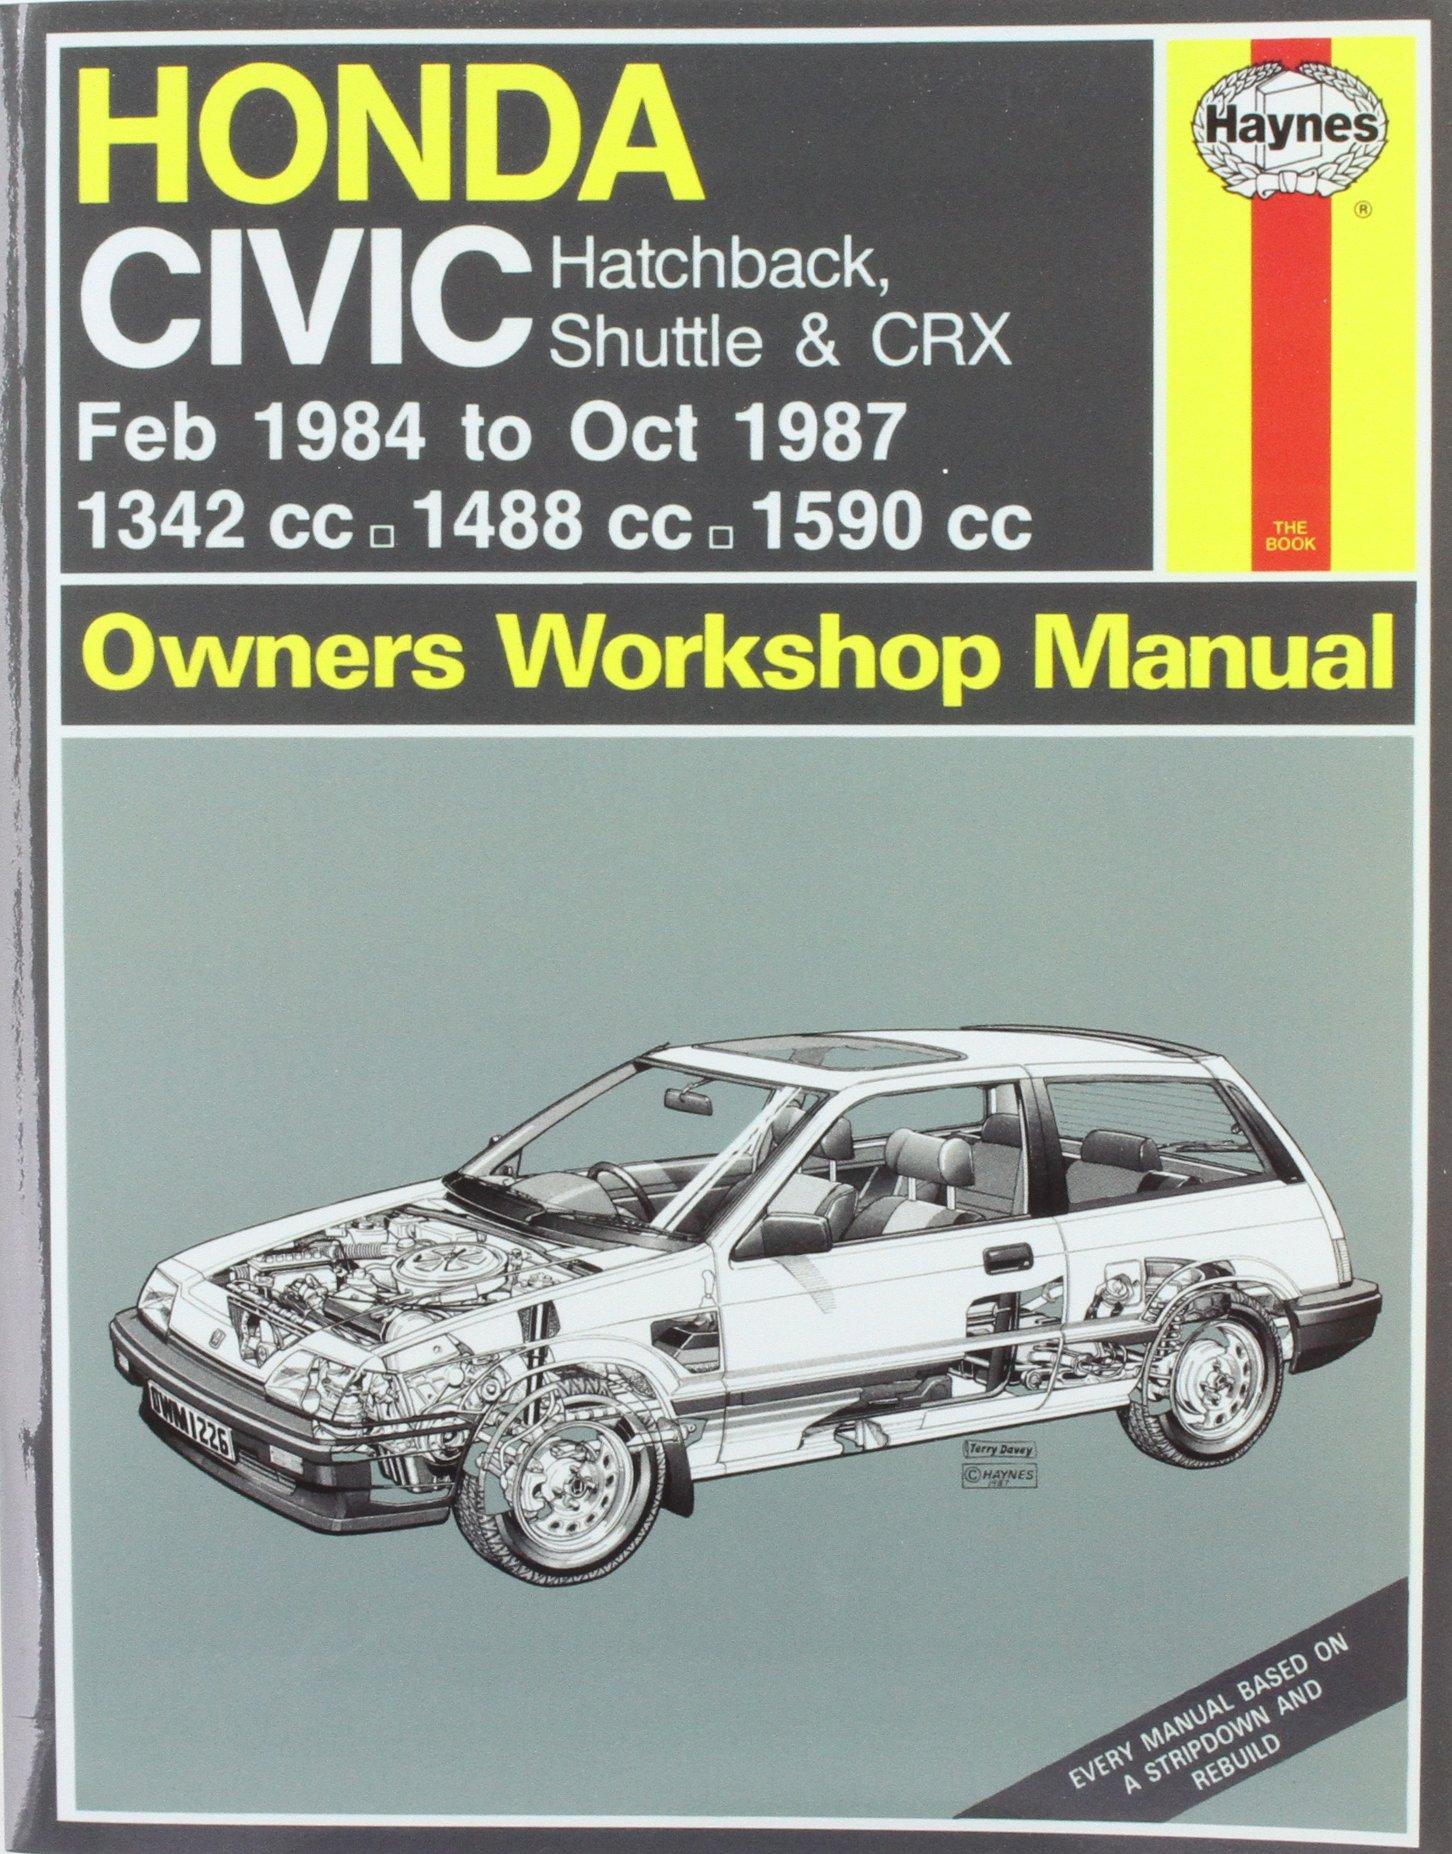 Honda Civic Hatchback, Shuttle and CRX 1984-87 Owner's Workshop Manual ( Service & repair manuals): John S. Mead: 9781850106203: Amazon.com: Books